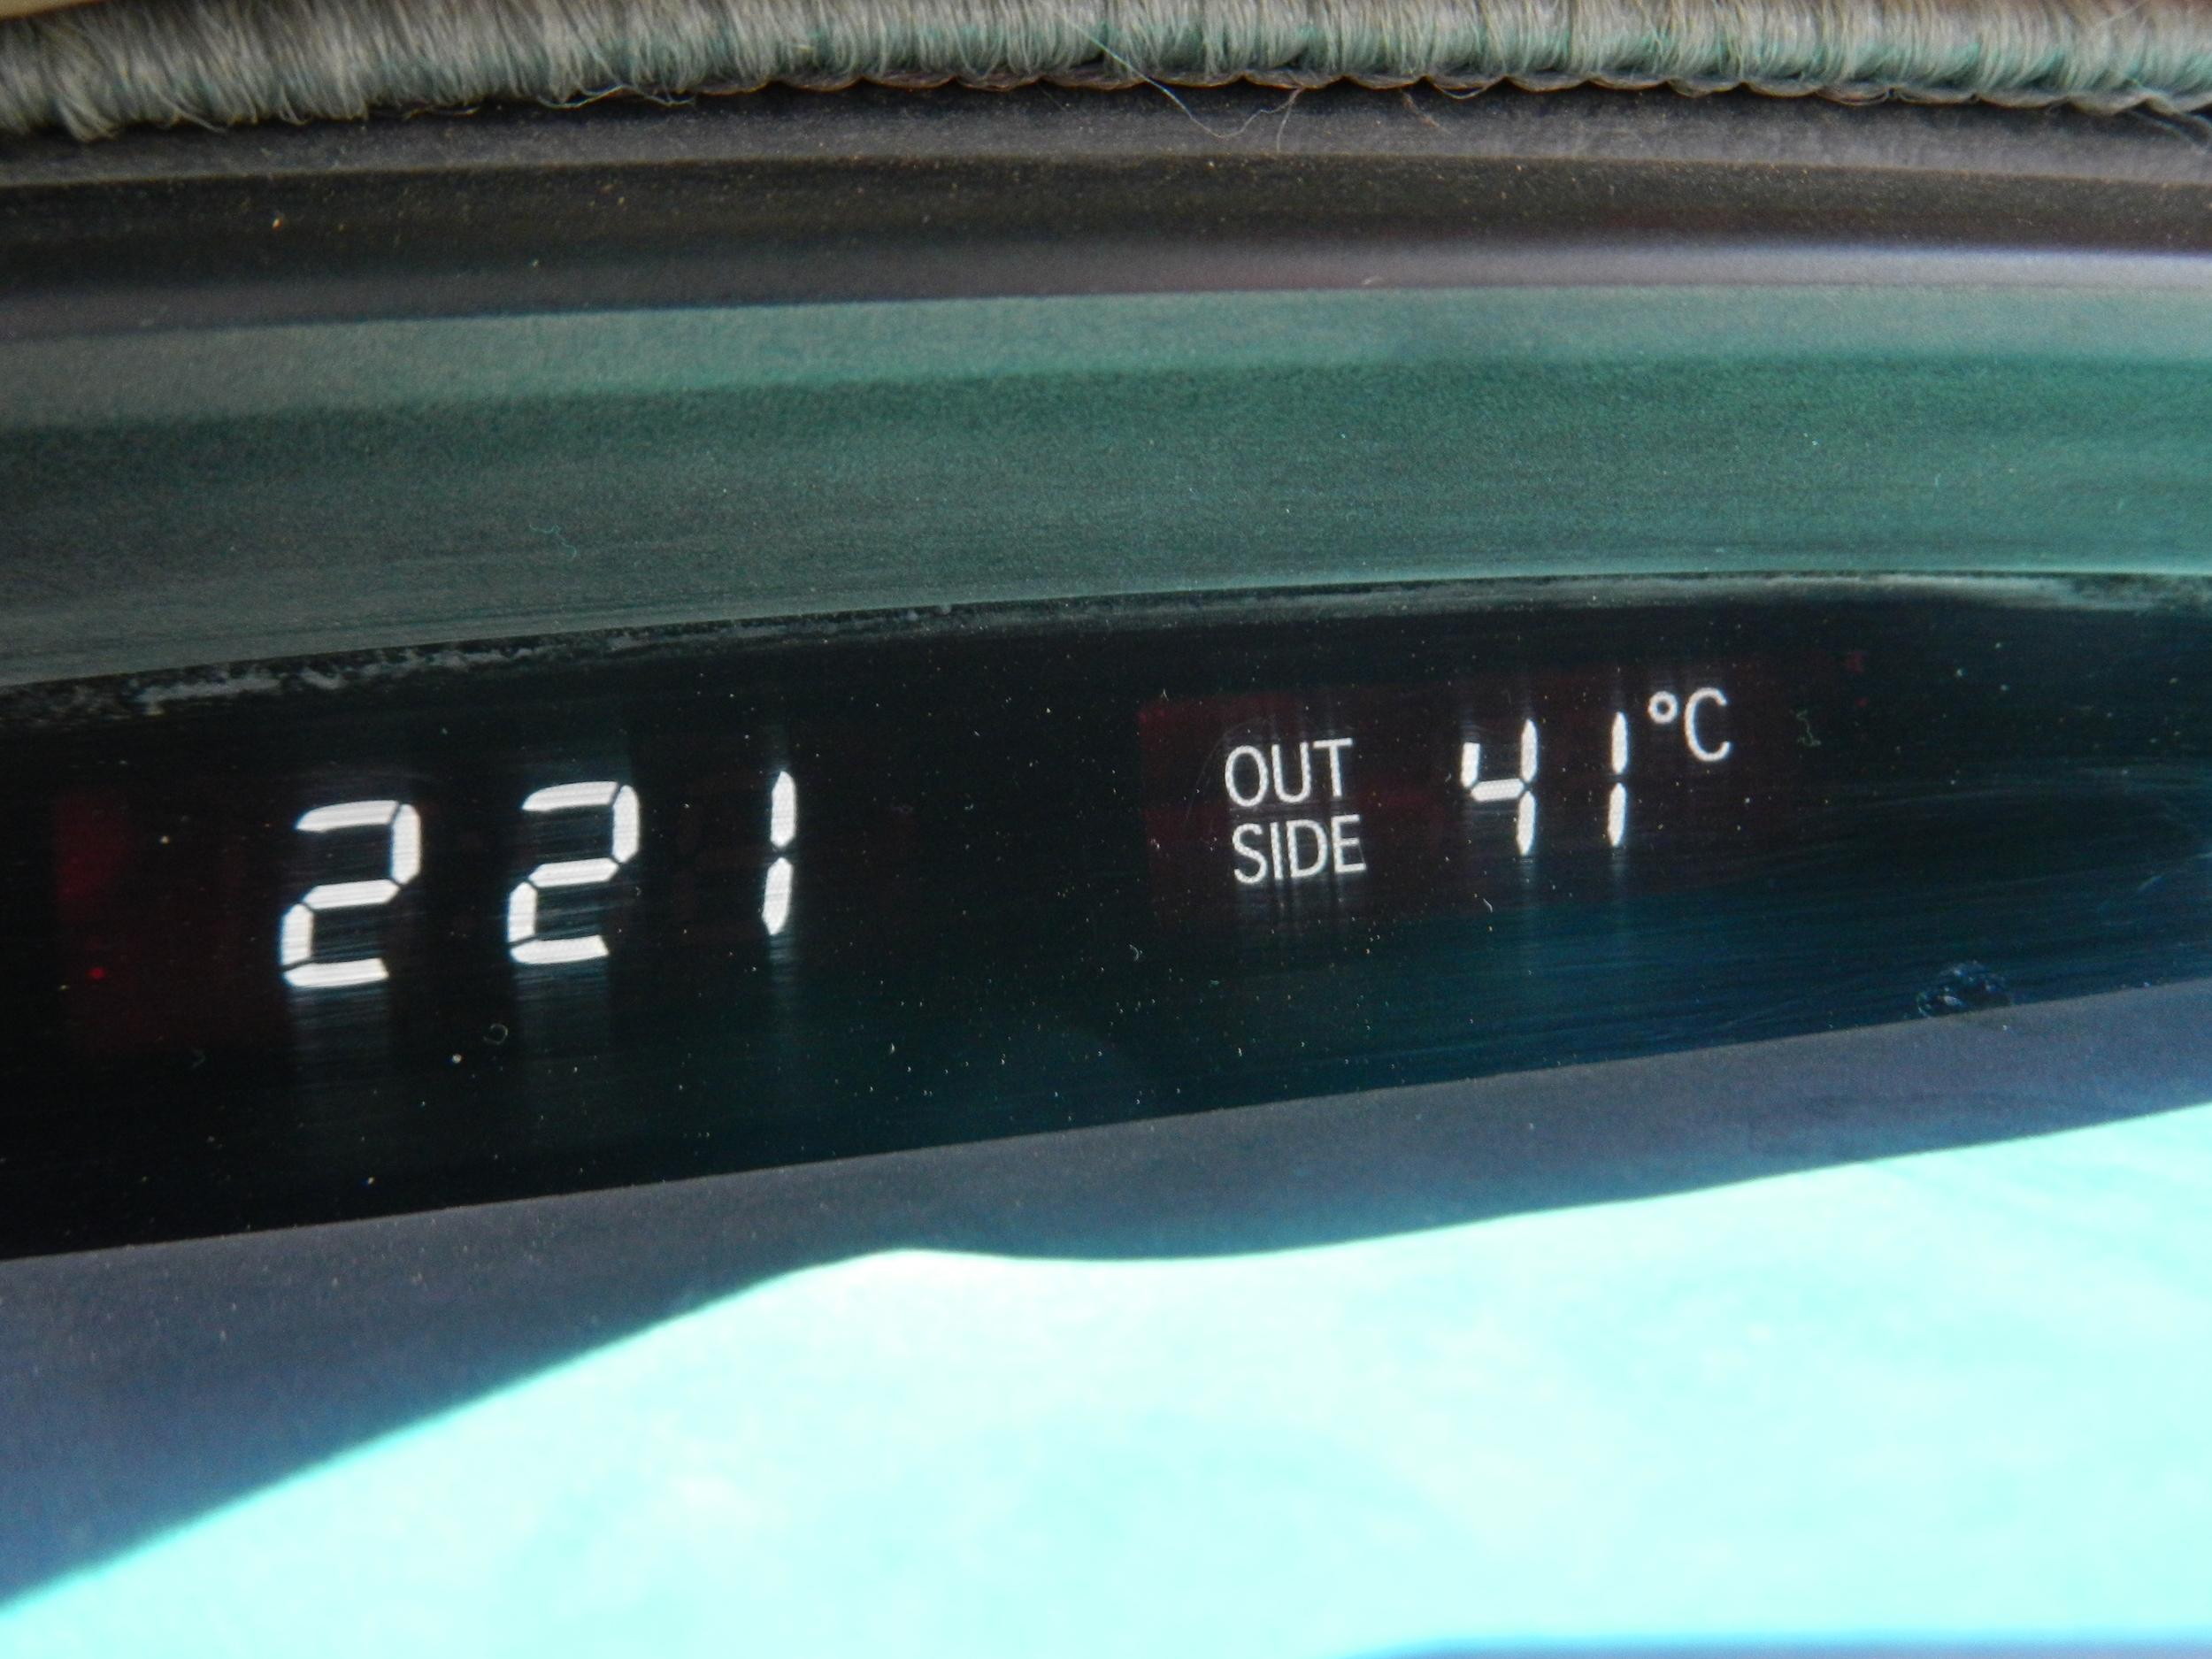 41 degrees!